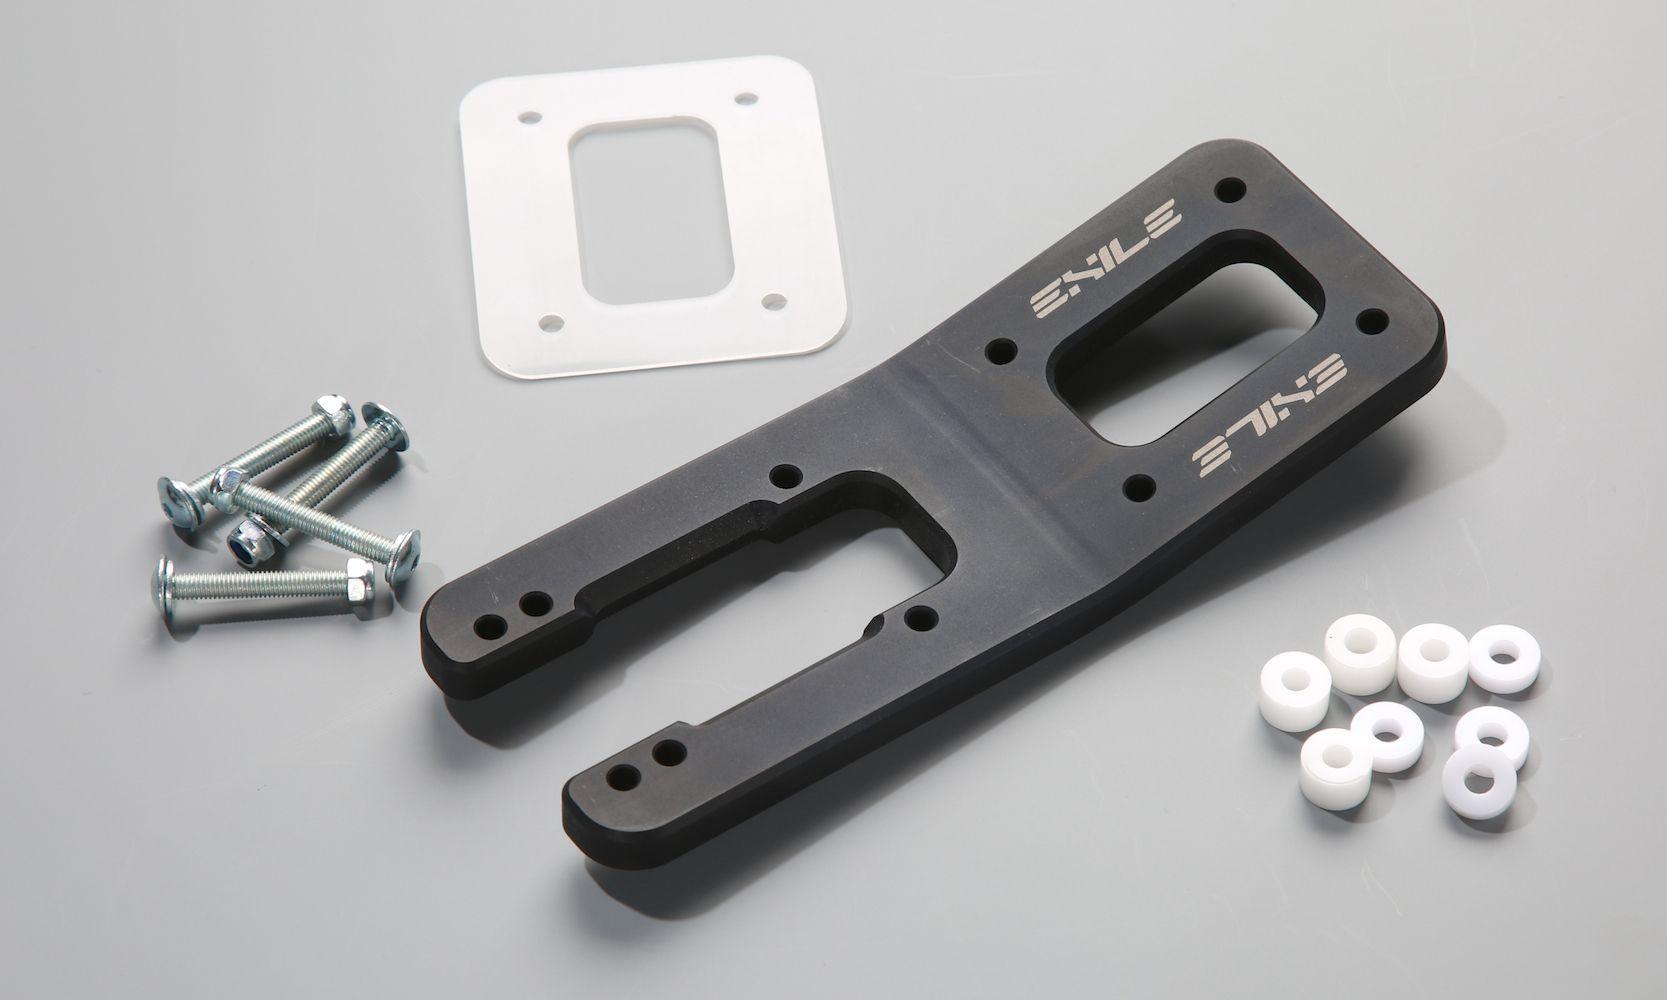 EXILE 13º Bracket - CNC machined fork for LDP platforms. Pumping AND psuhing the easy way! #longdistanceskating #bracket #platform #EXILE MFG